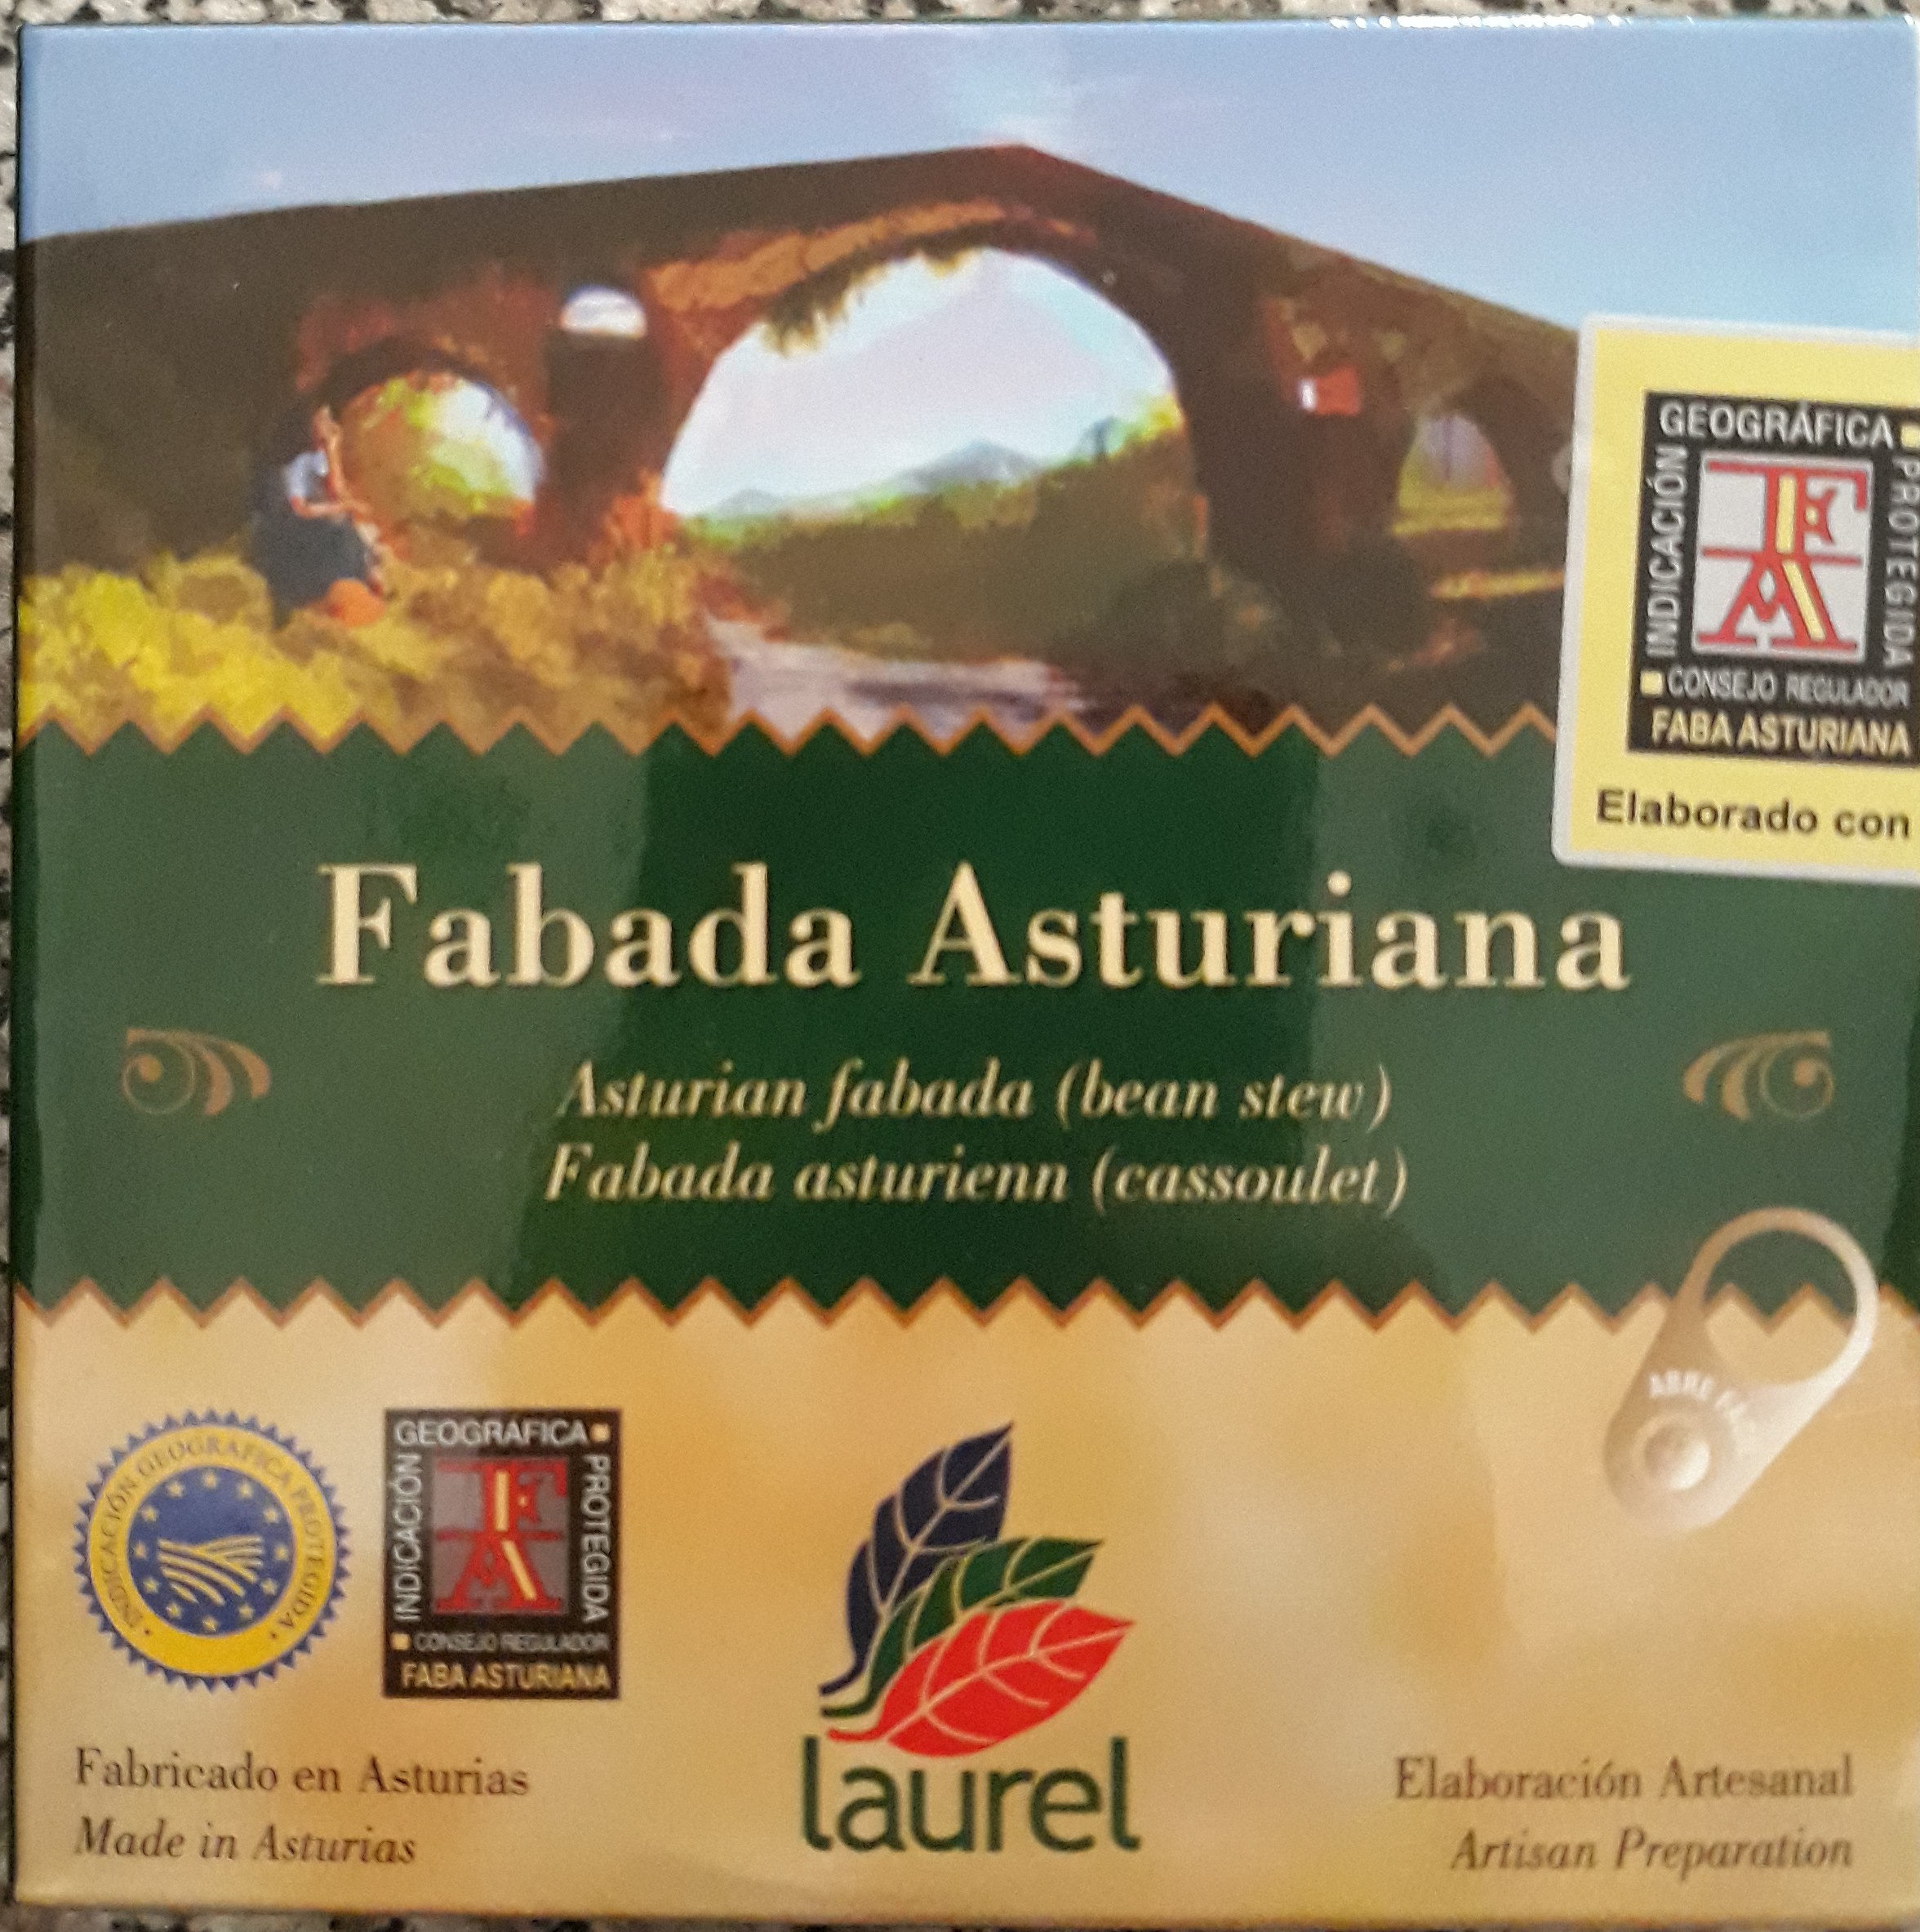 Fabada asturiana - Product